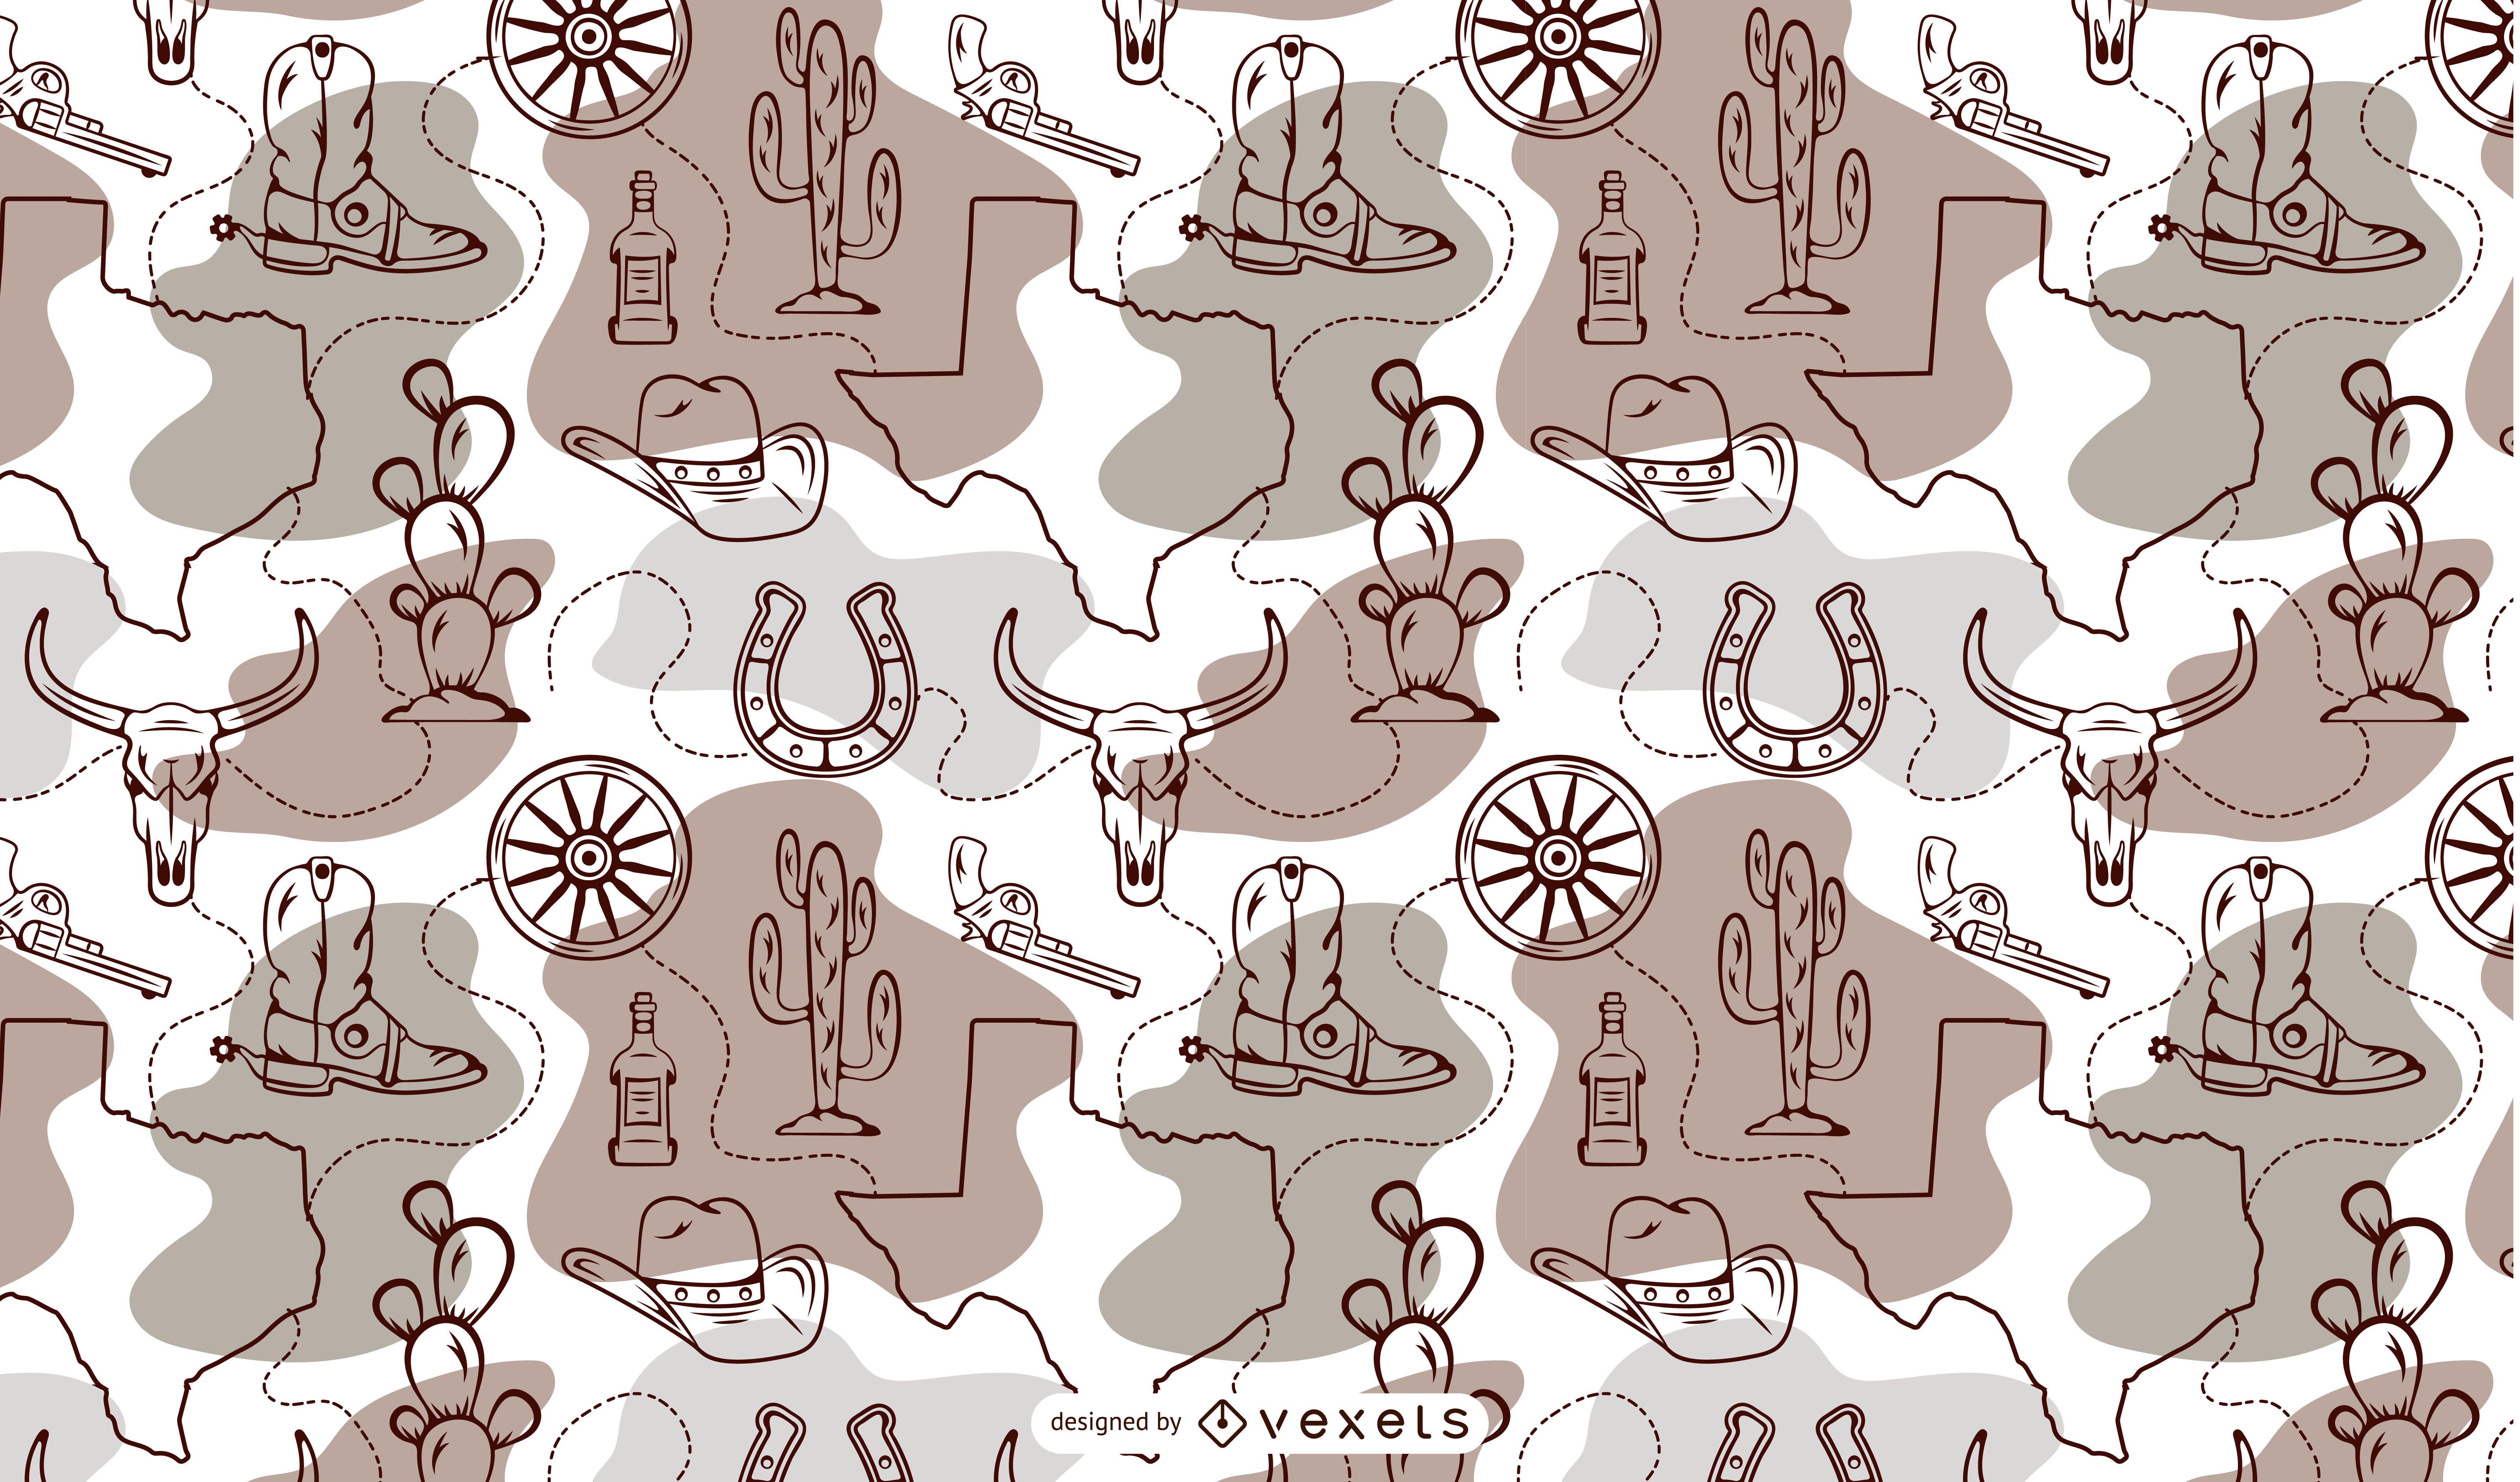 Texas state cowboy pattern design